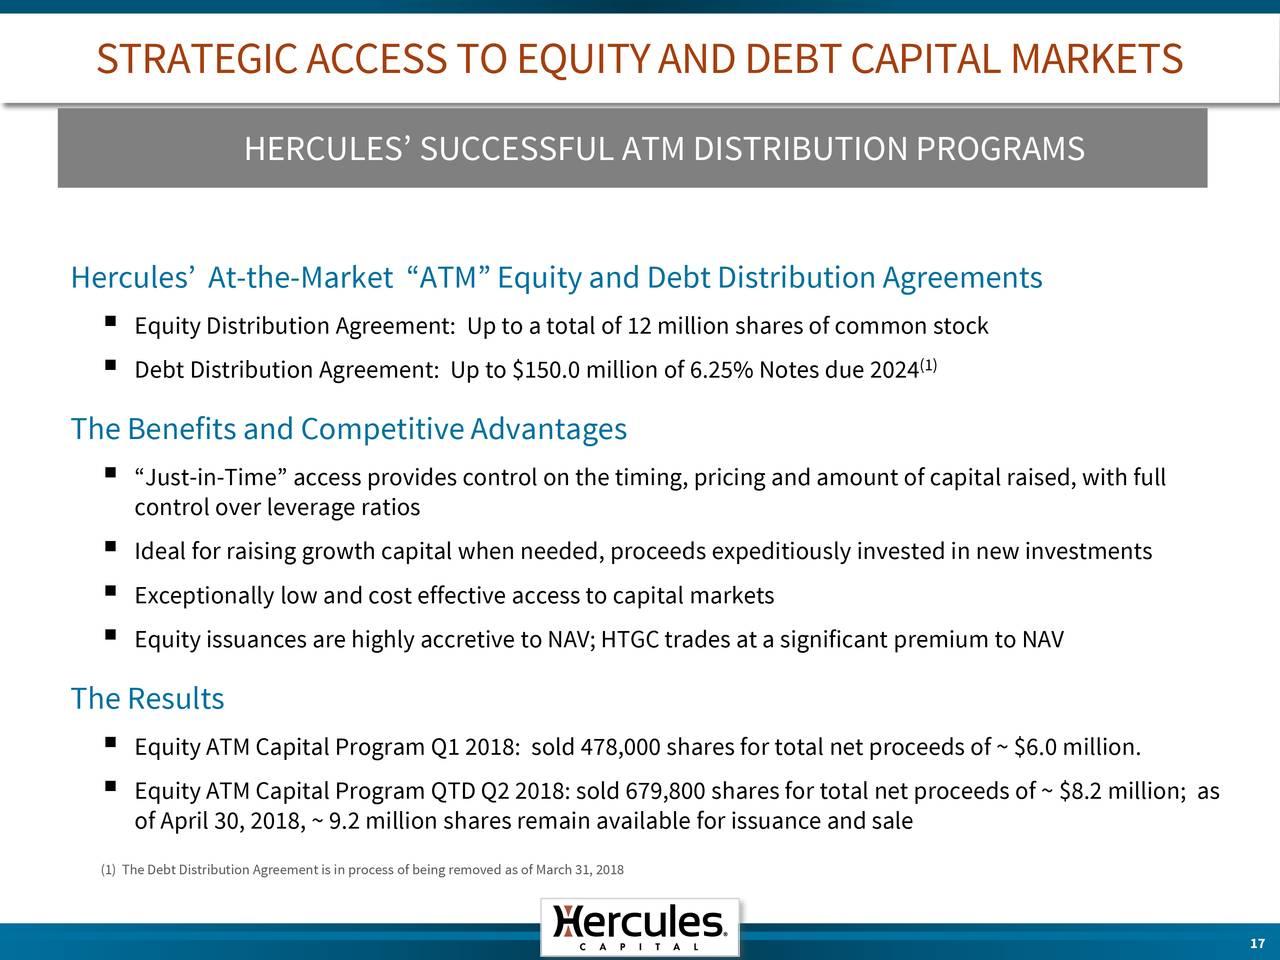 atm program equity